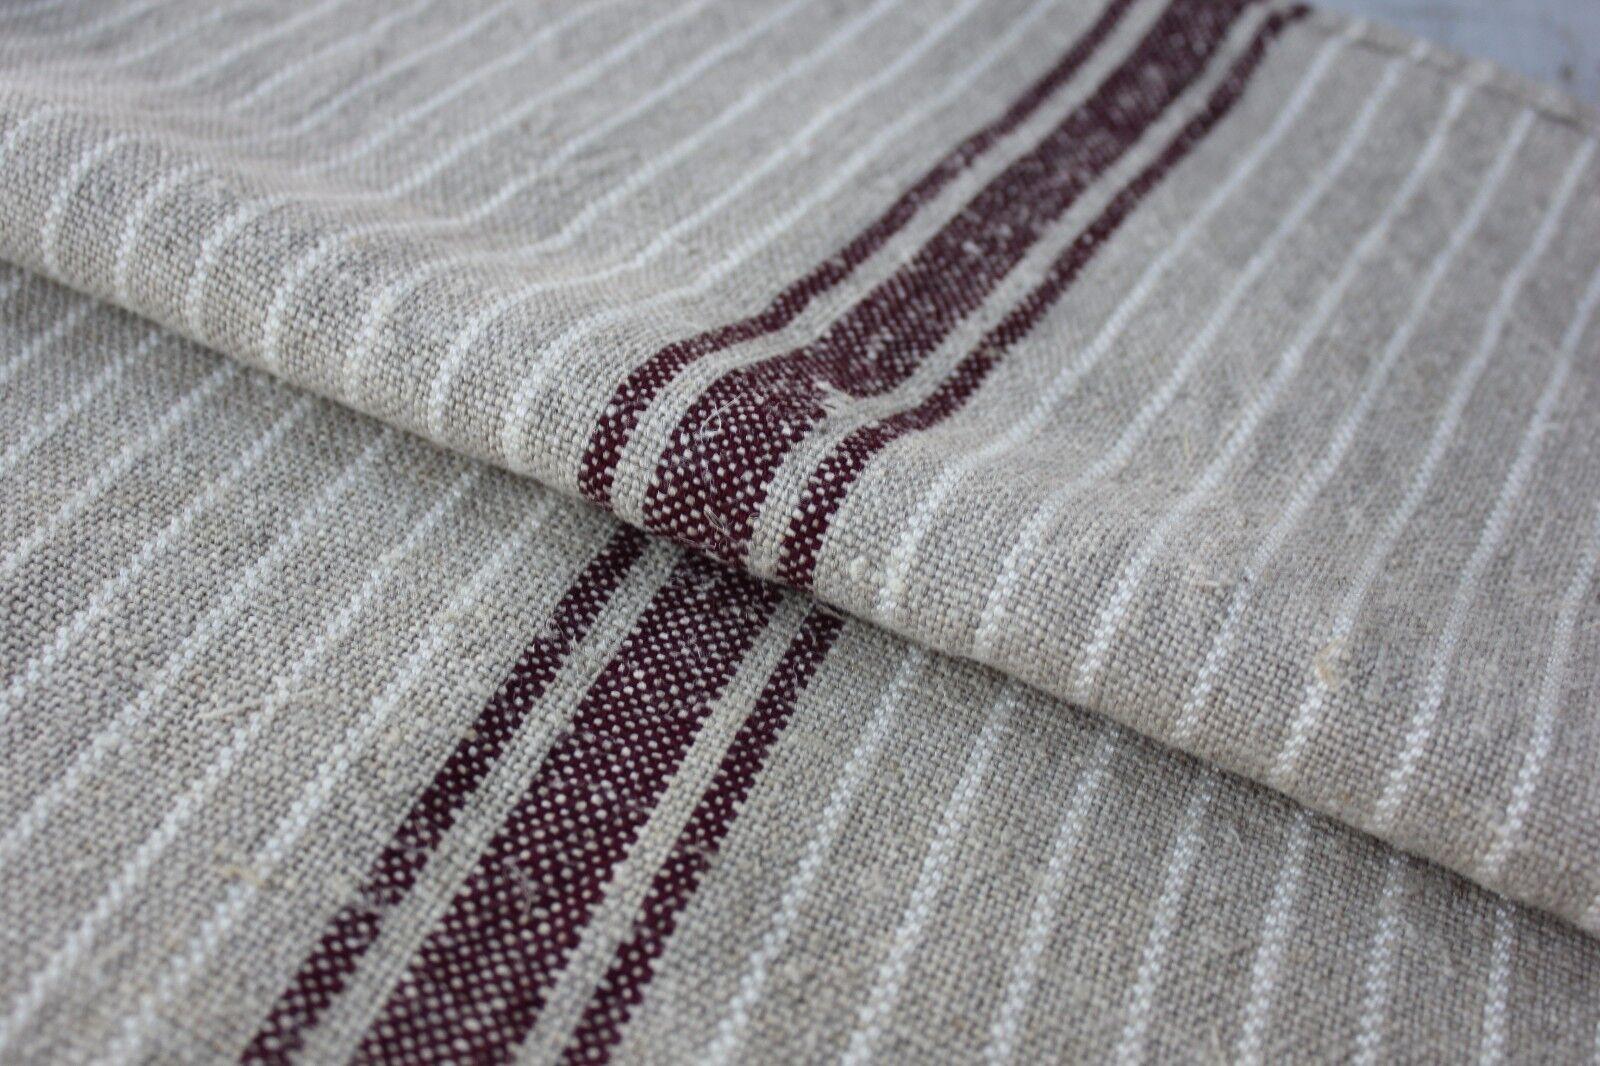 Raspberry pink  RARE grain sack grainsack old feed bag Washed linen cotton hemp organic Linen